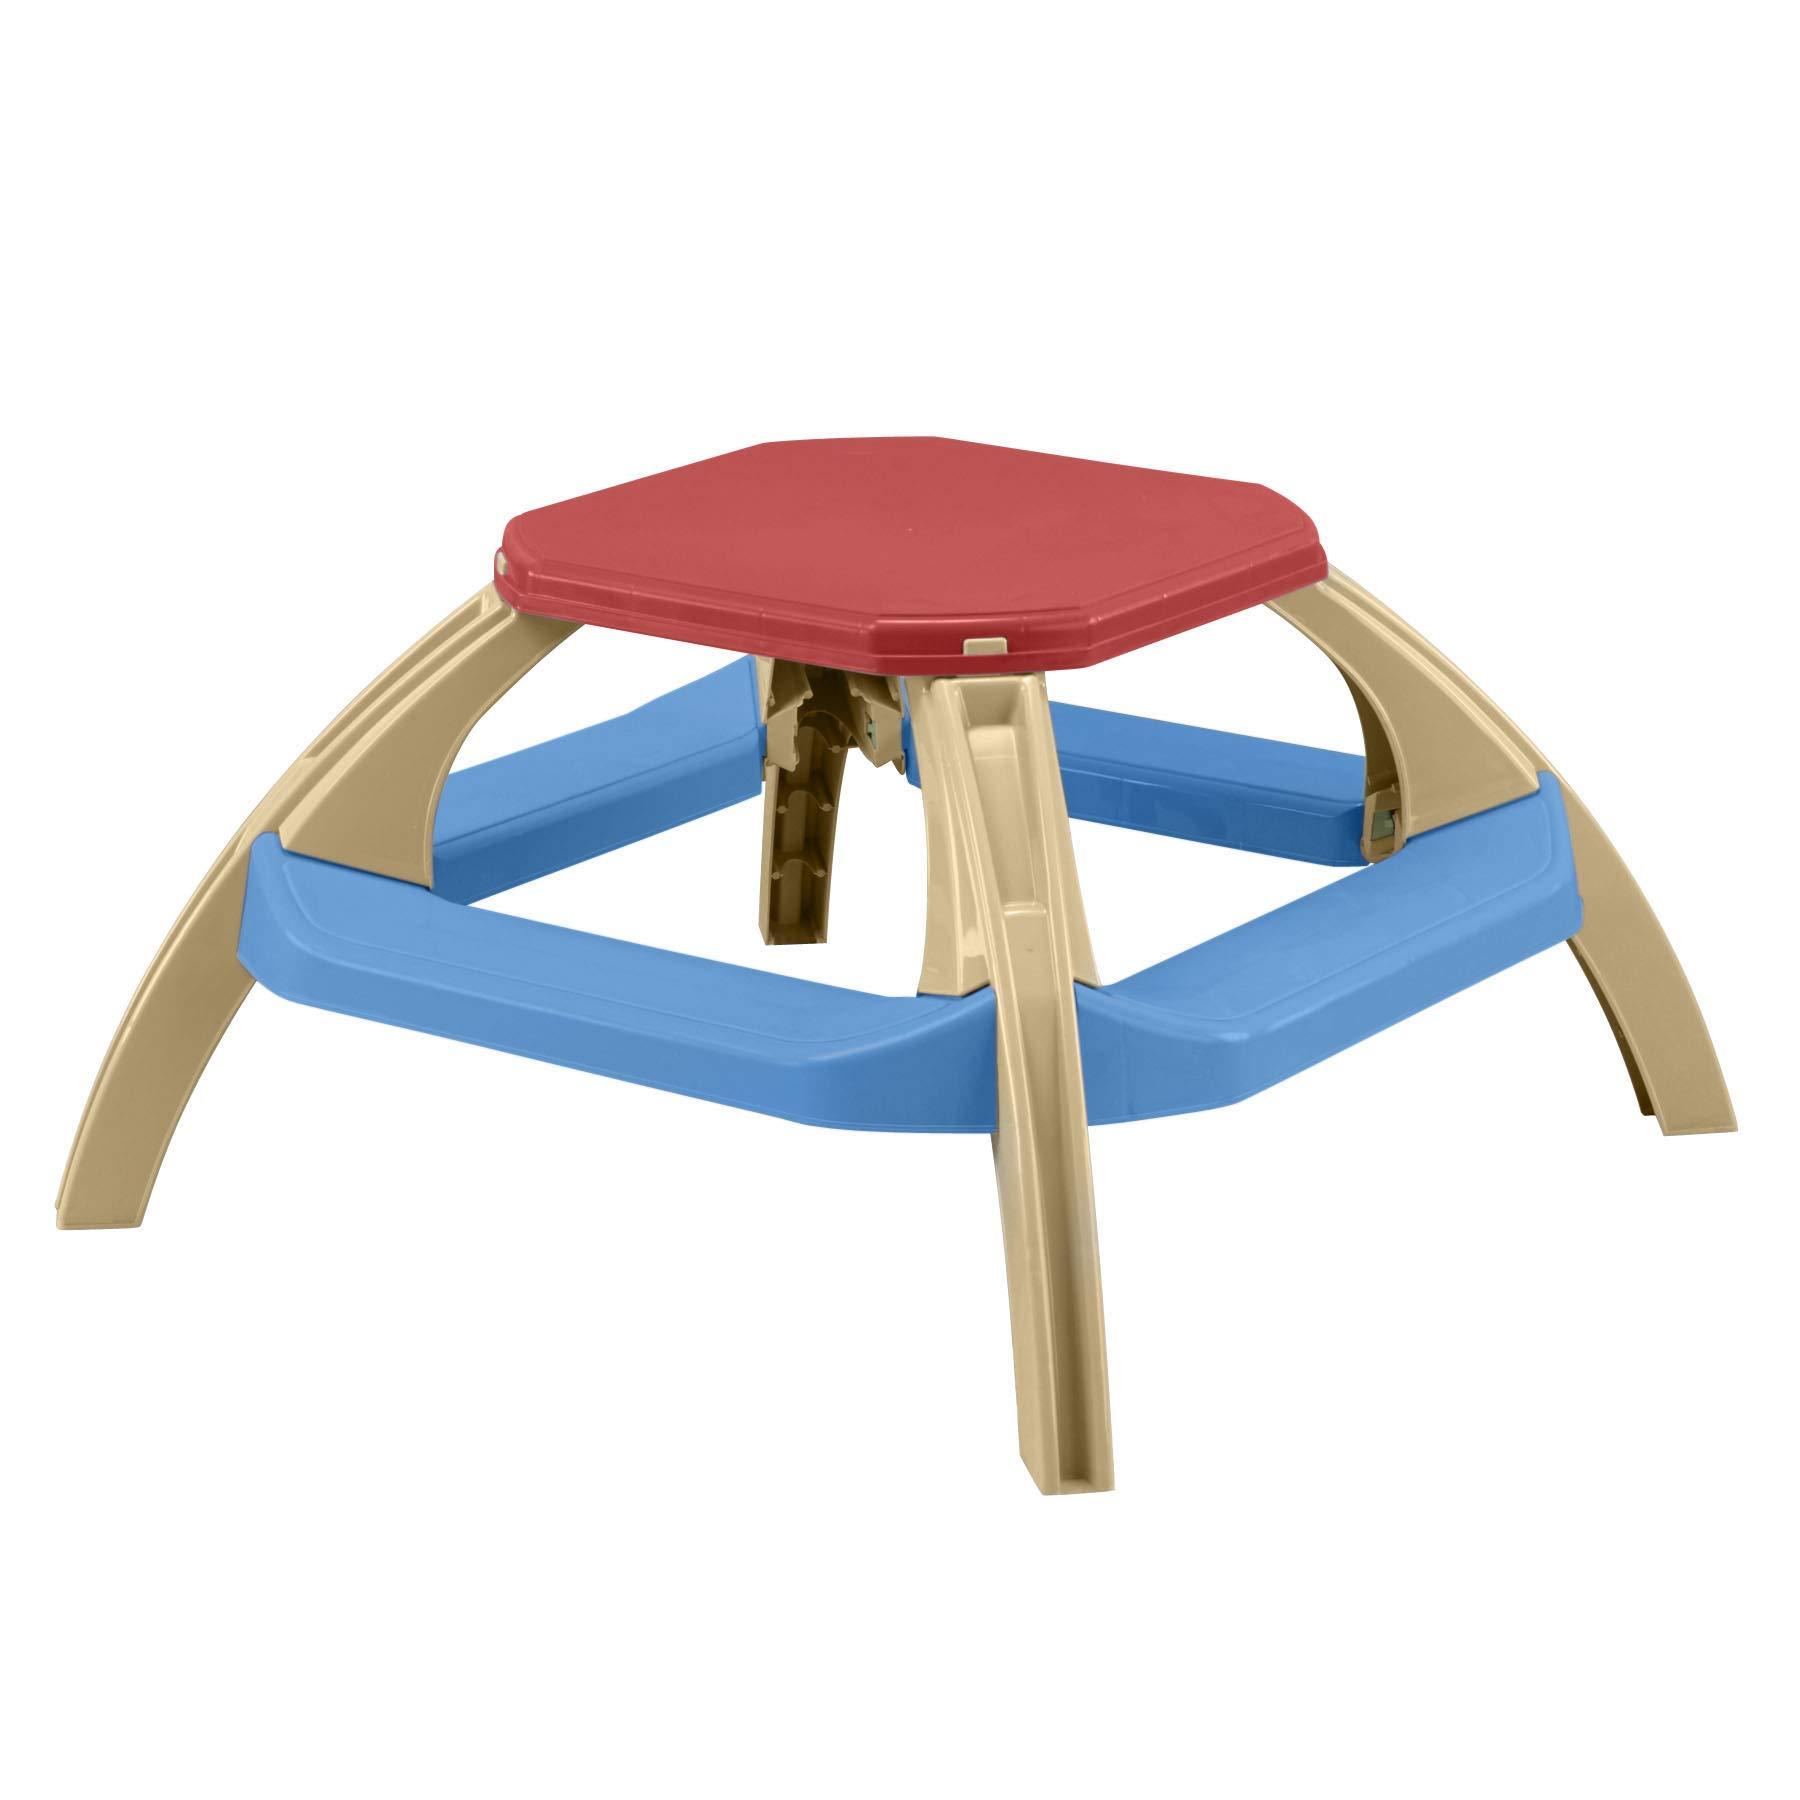 American Plastic Toys Kids Picnic Table Colors May Vary by American Plastic Toys